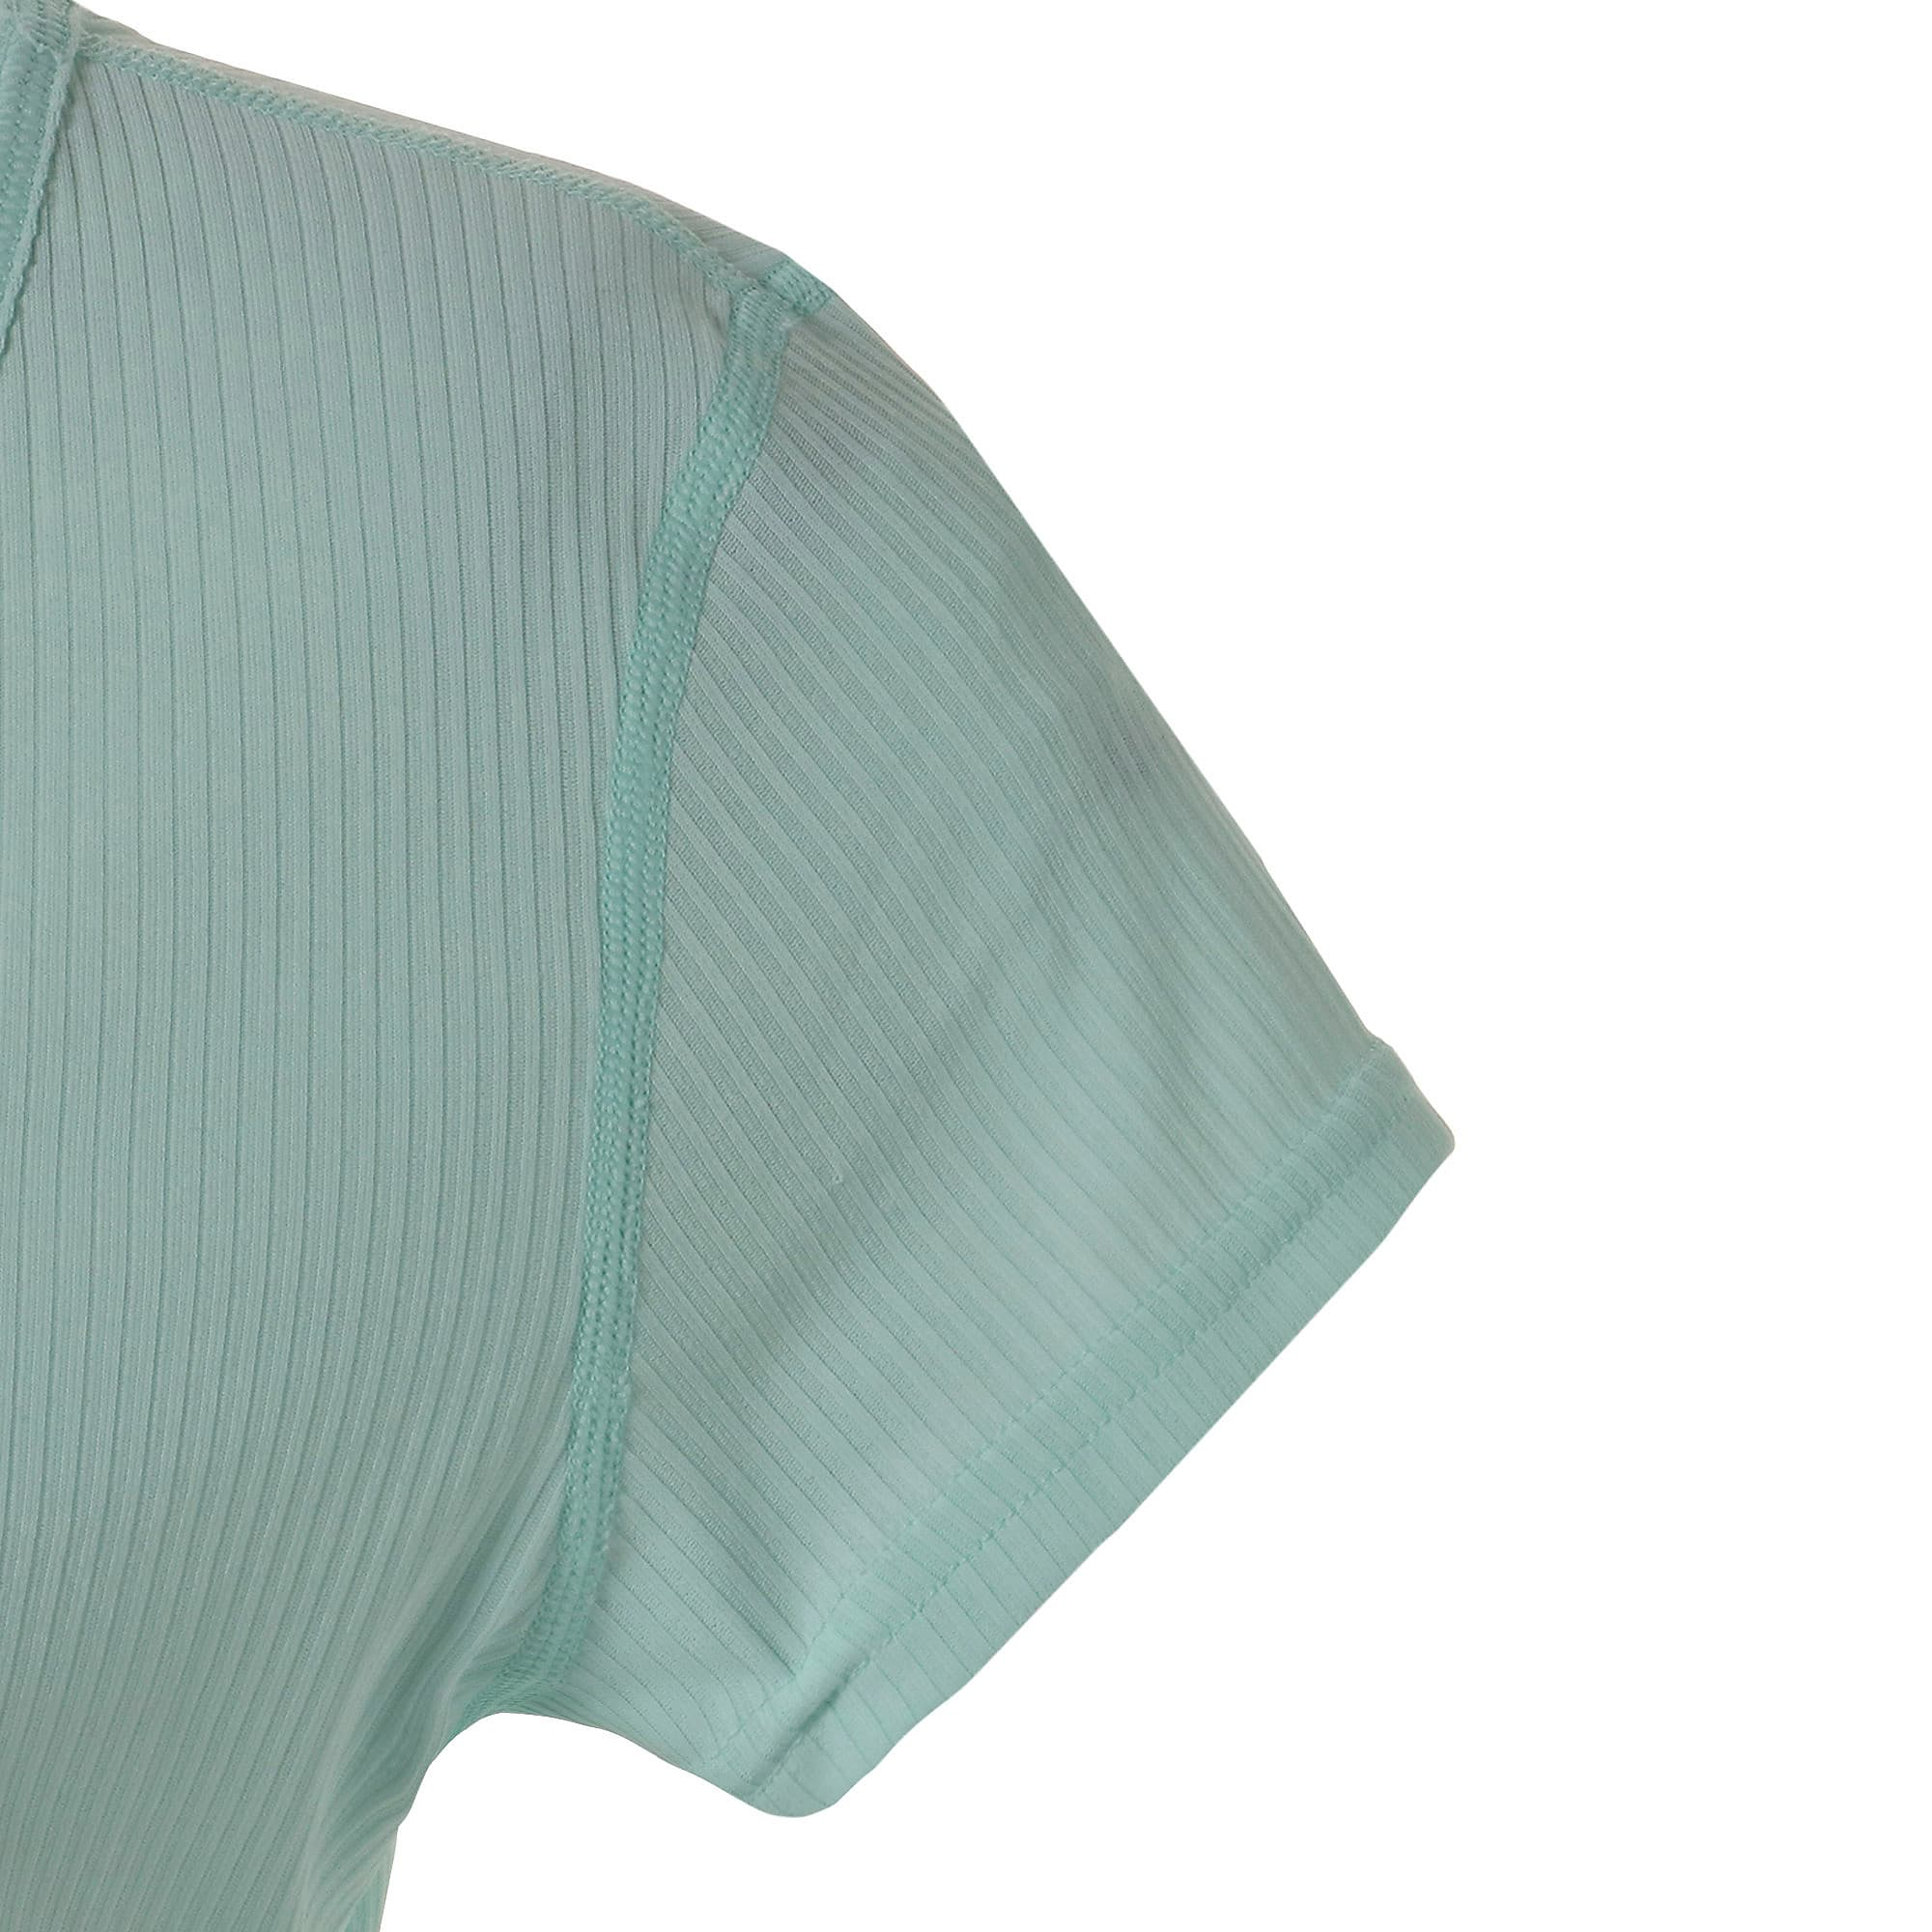 Thumbnail 7 of イグナイト SS ロゴ ウィメンズ Tシャツ 半袖, Fair Aqua, medium-JPN